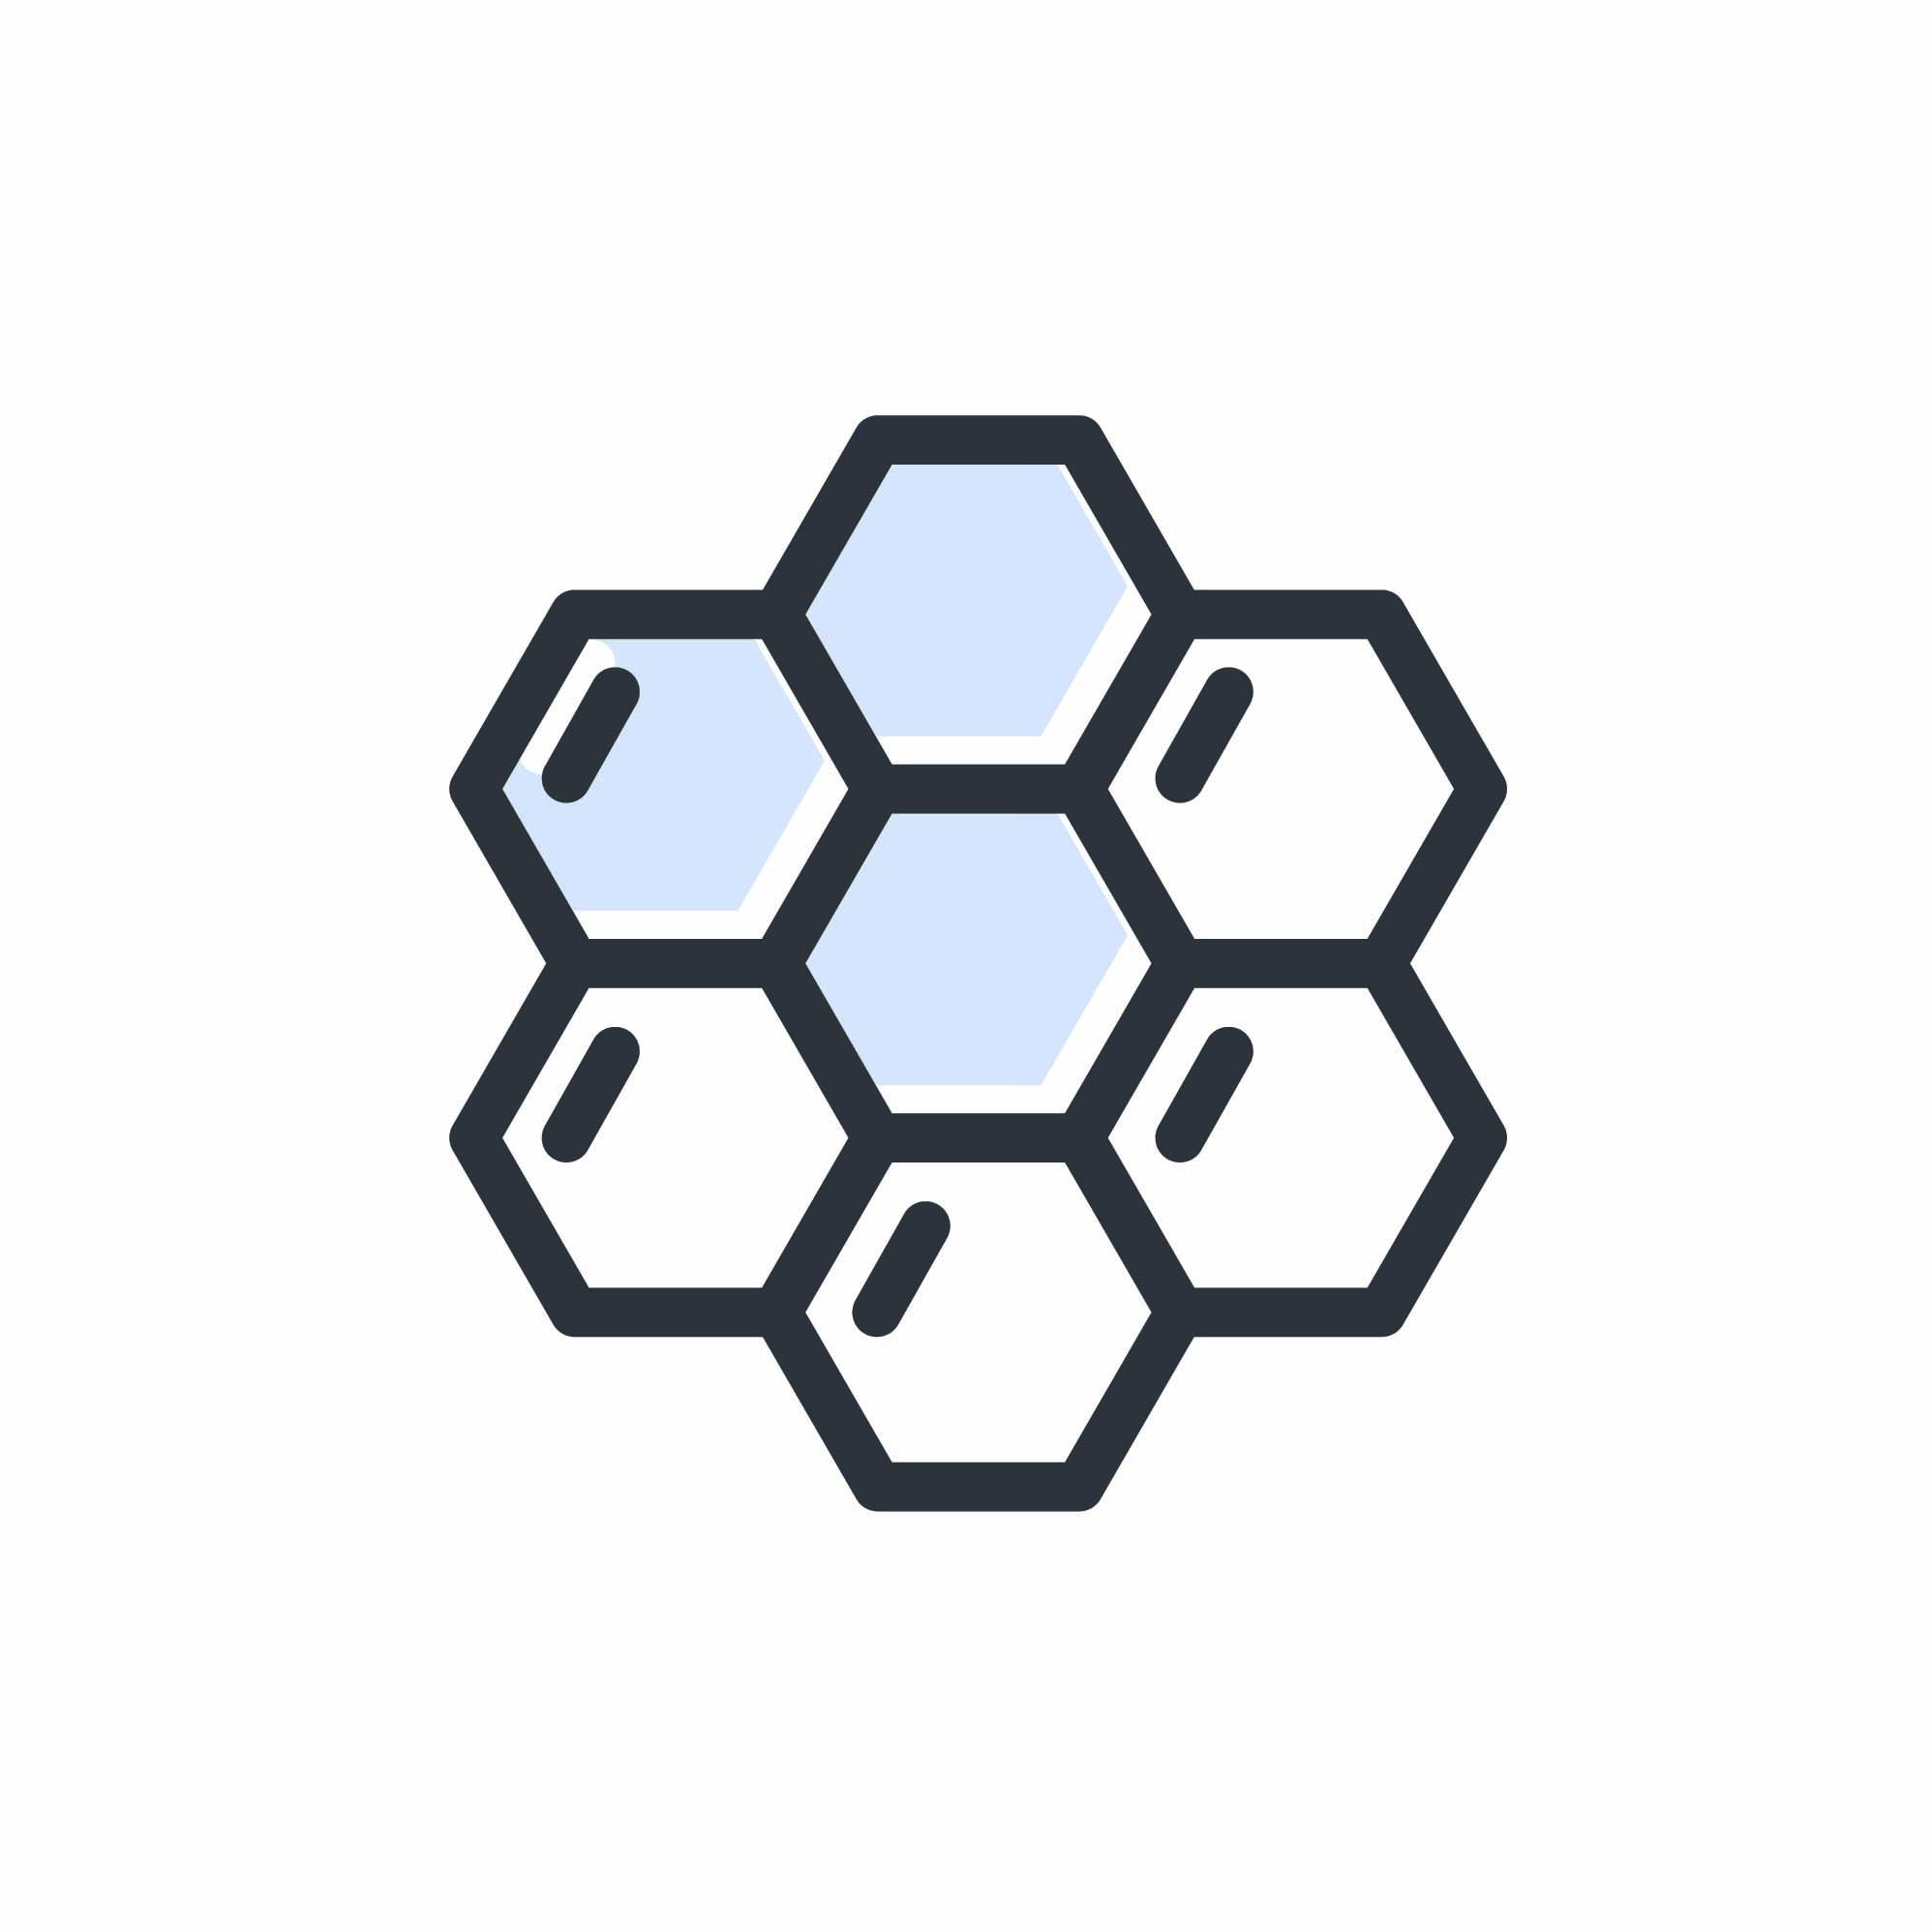 hex icon transperonal development huntington